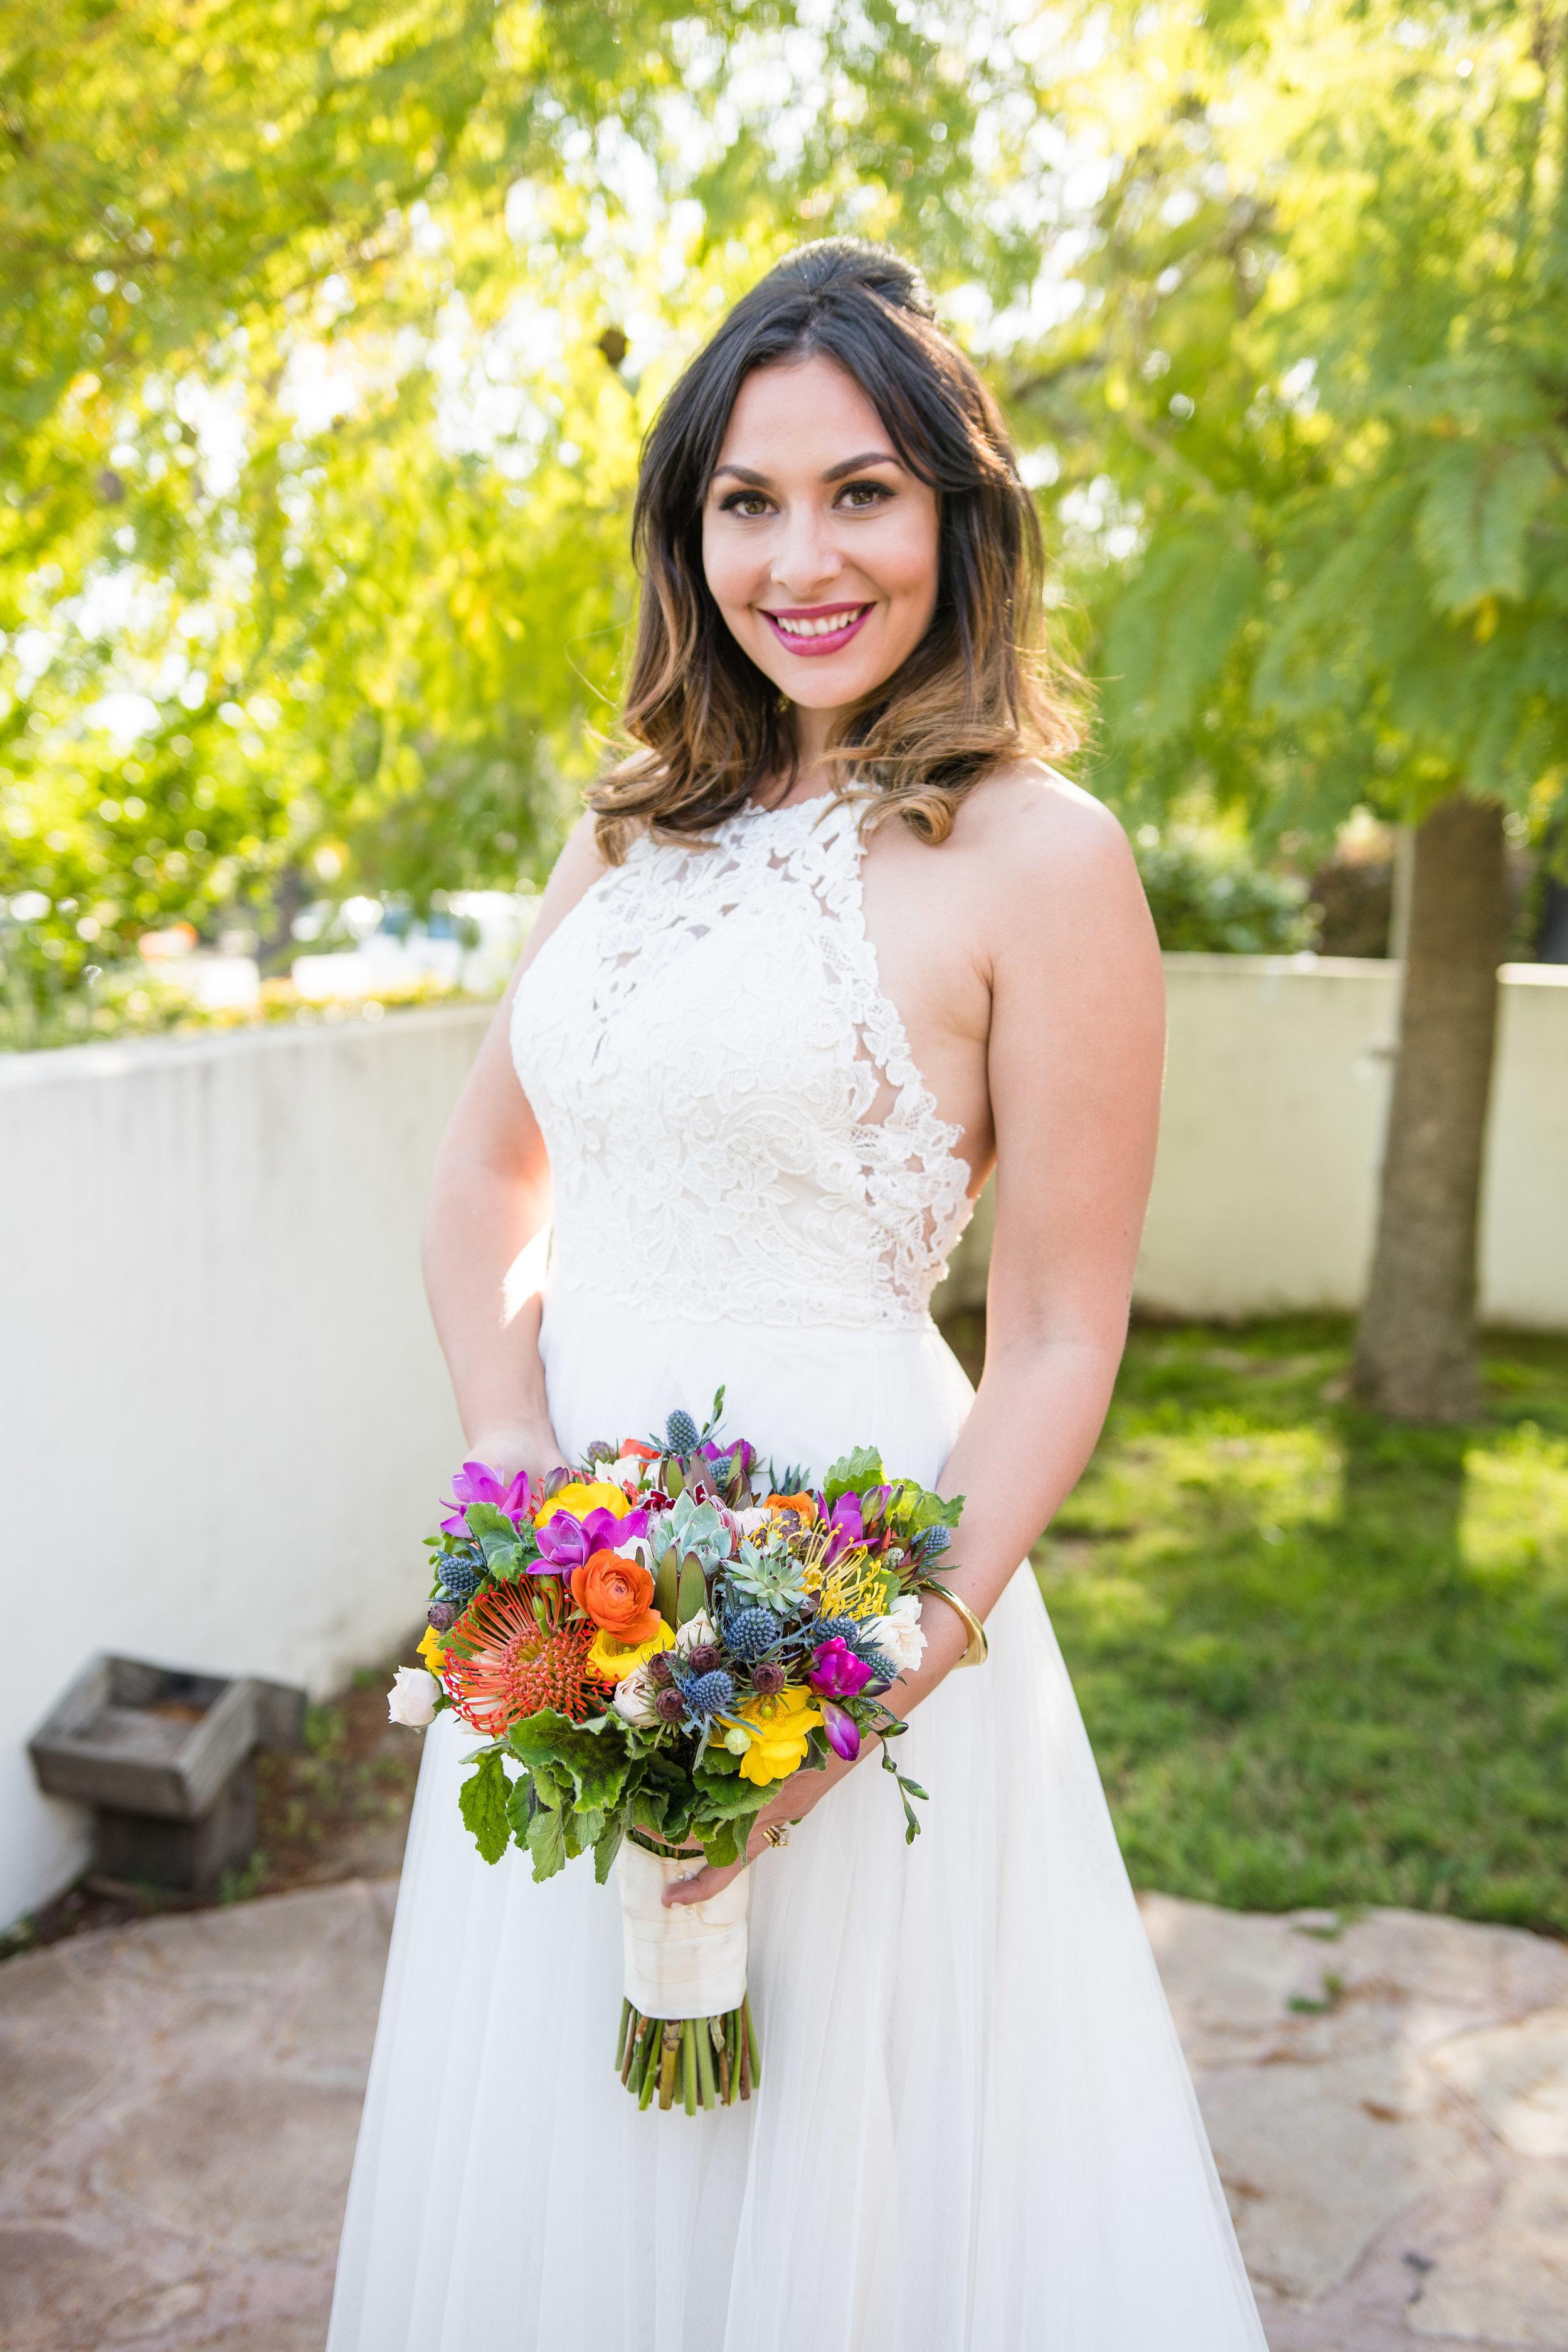 Vibrant Fiesta Backyard Wedding Reception beautiful bride and stunning spring bouquet.jpg